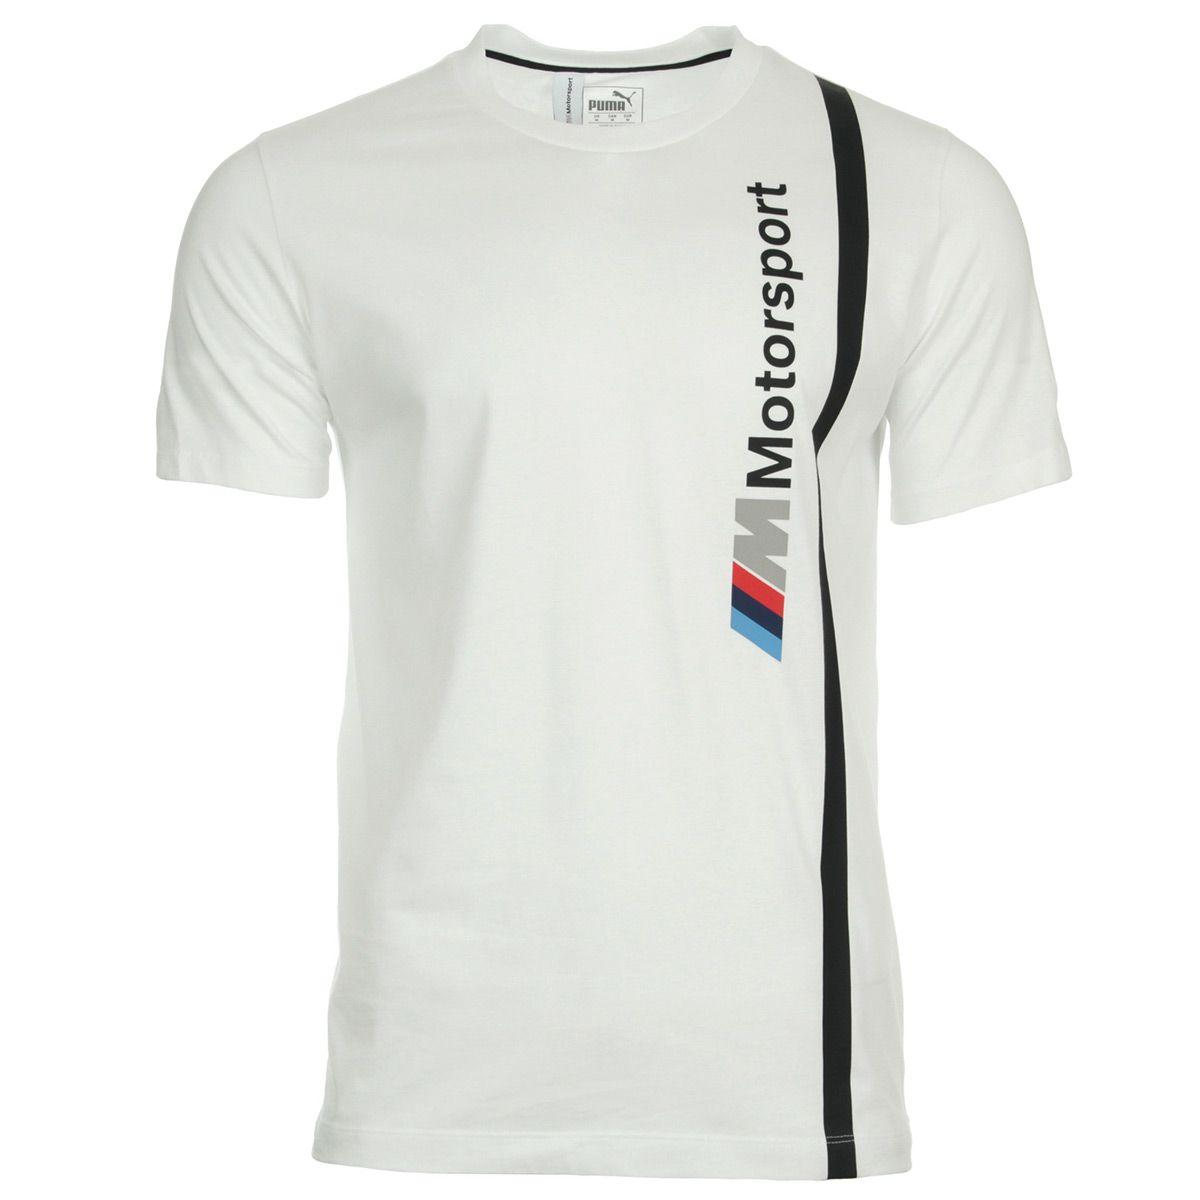 Camiseta BMW MMS Logo Branco  - Nova Centro Boutique Roupas para Motociclistas